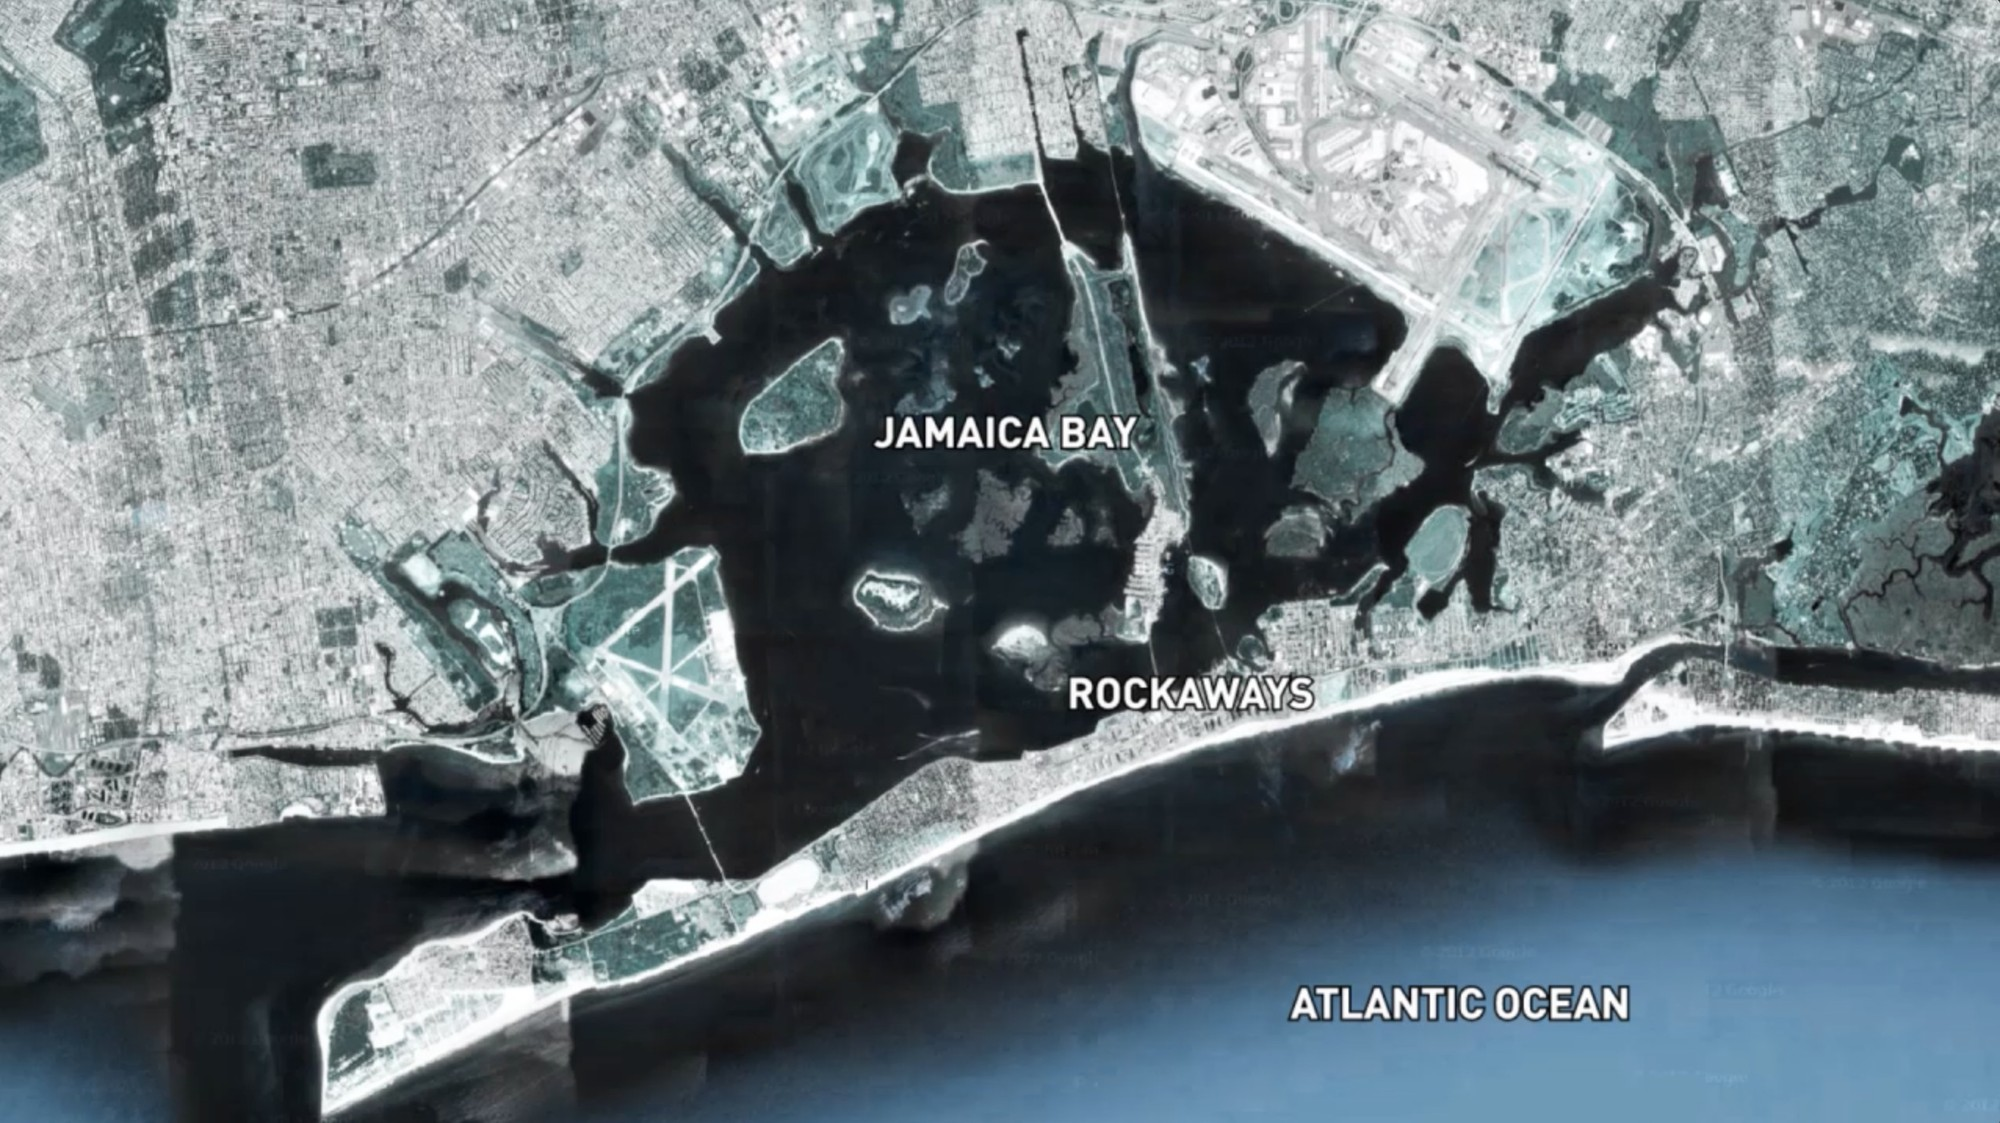 Jamaica Bay satellite developed